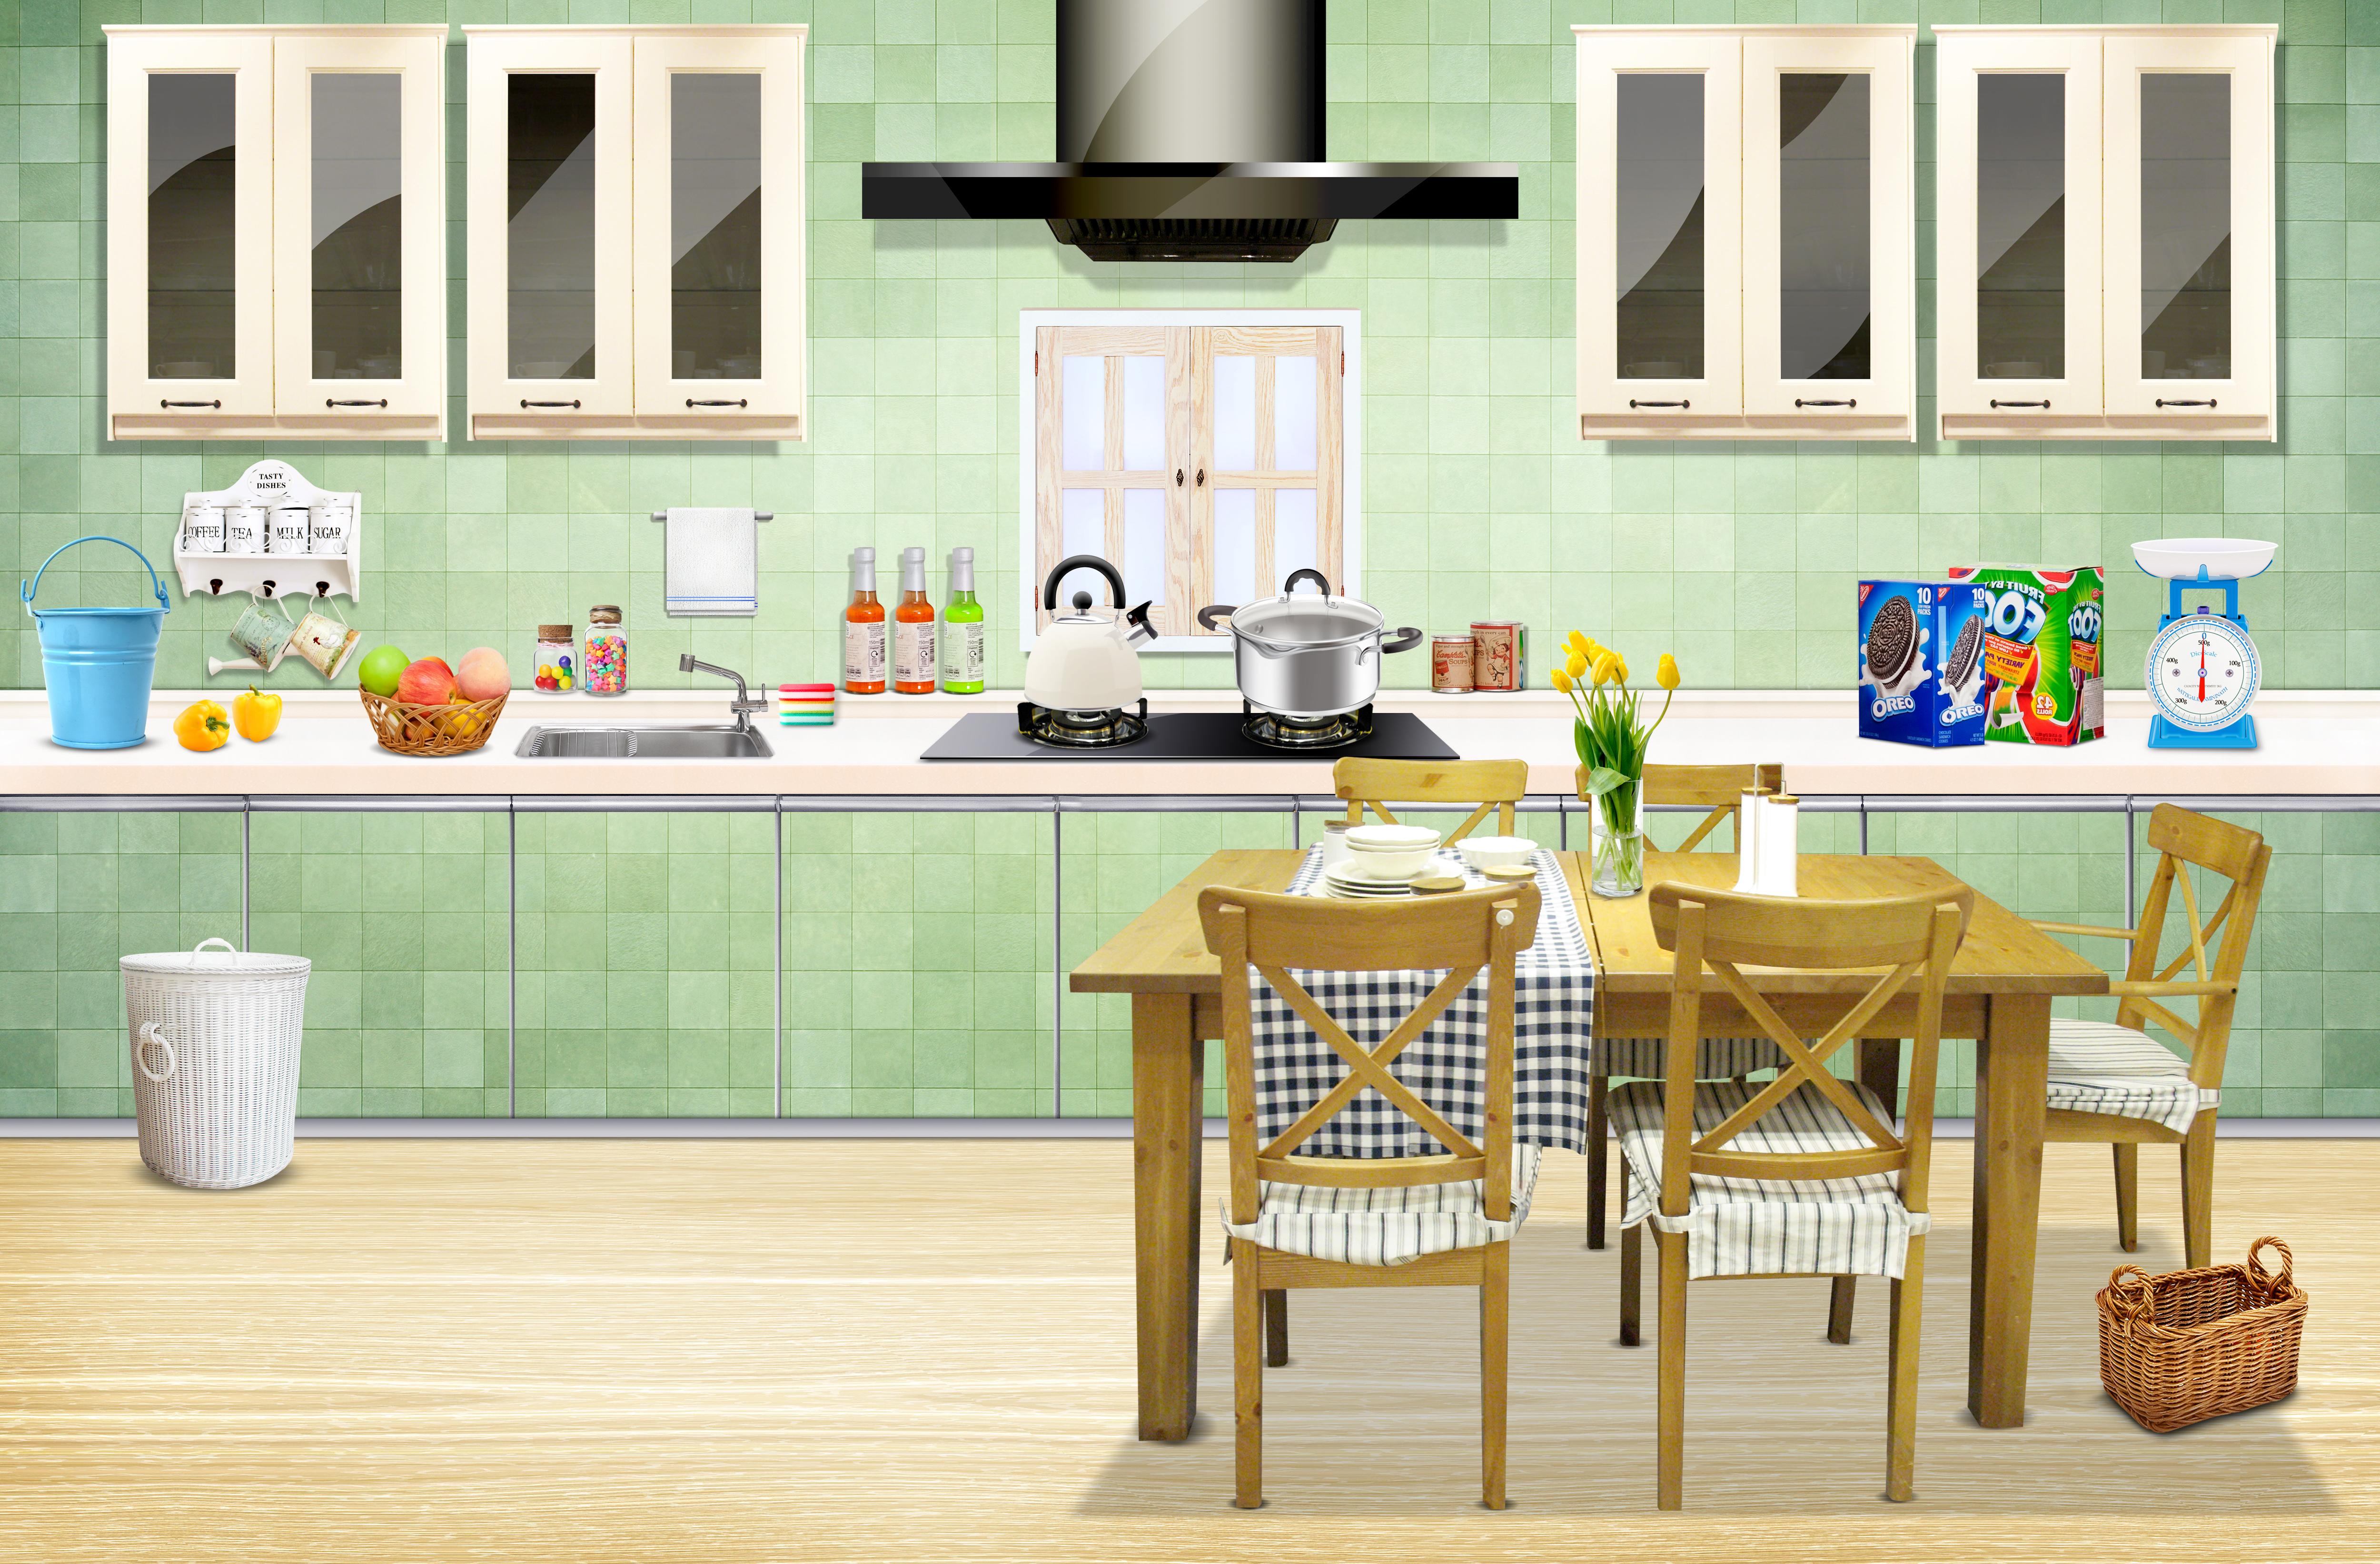 Комната кухня картинки для детей